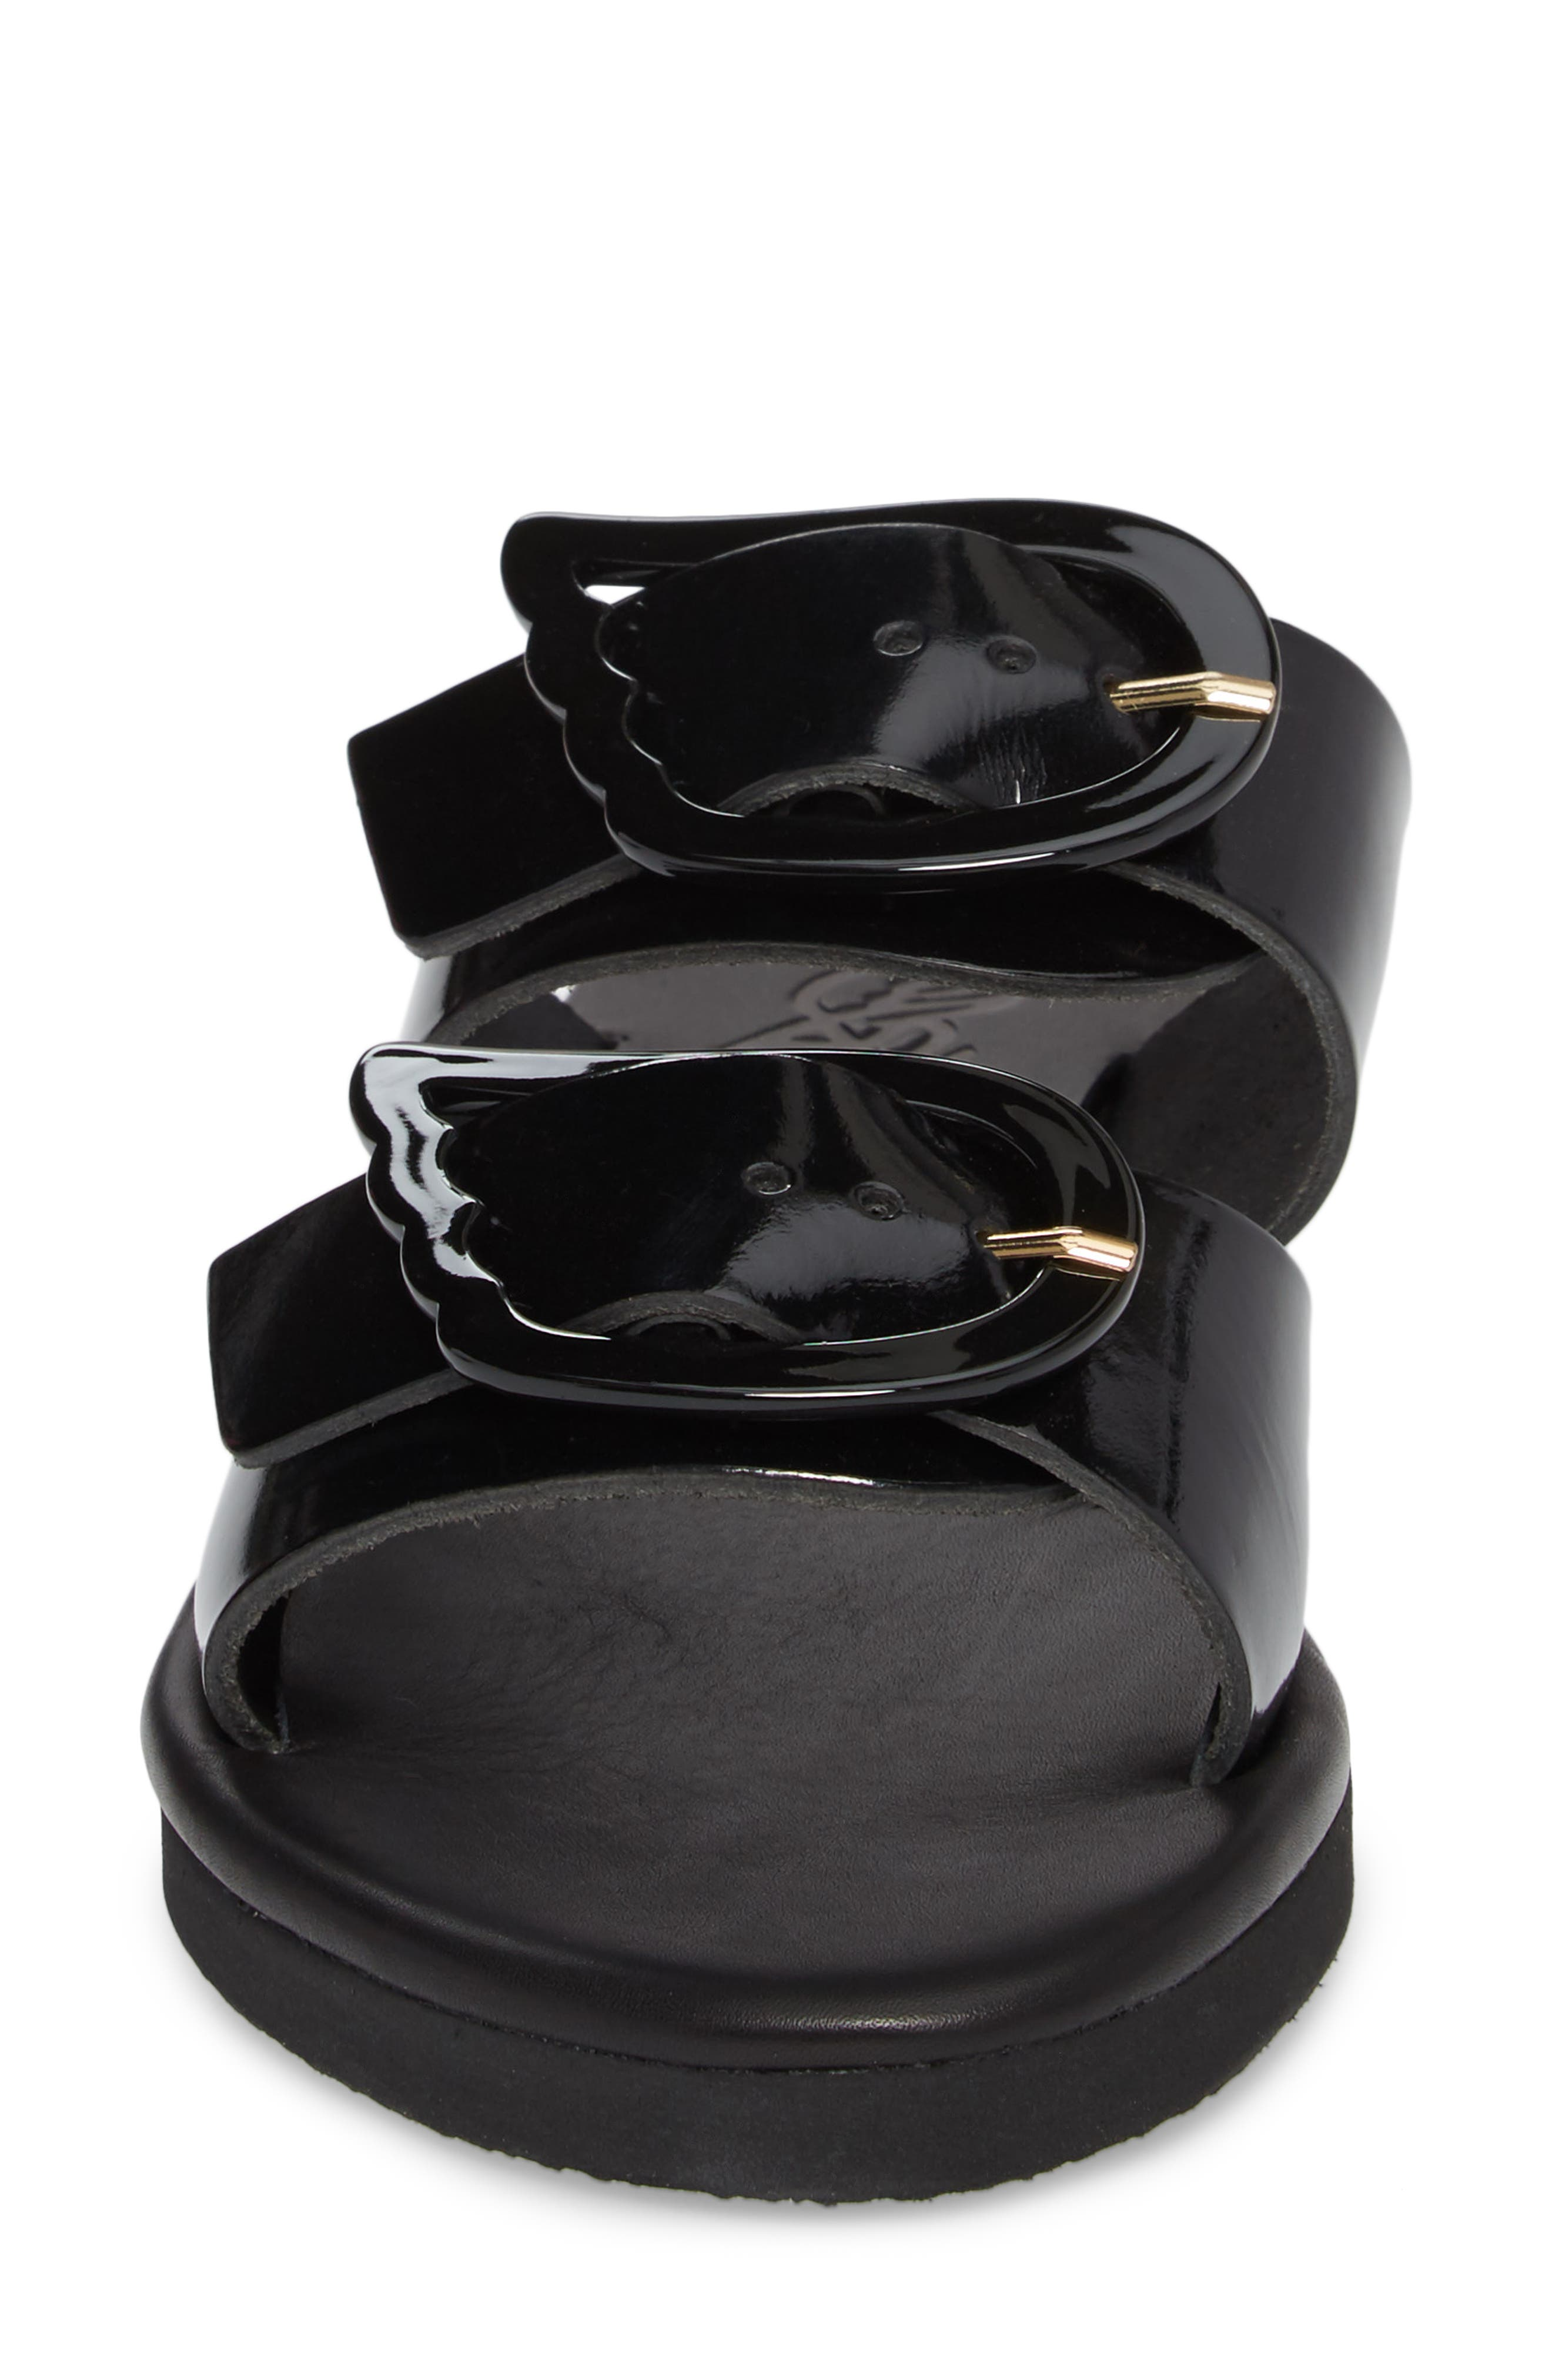 Iaso Slide Sandal,                             Alternate thumbnail 4, color,                             Black